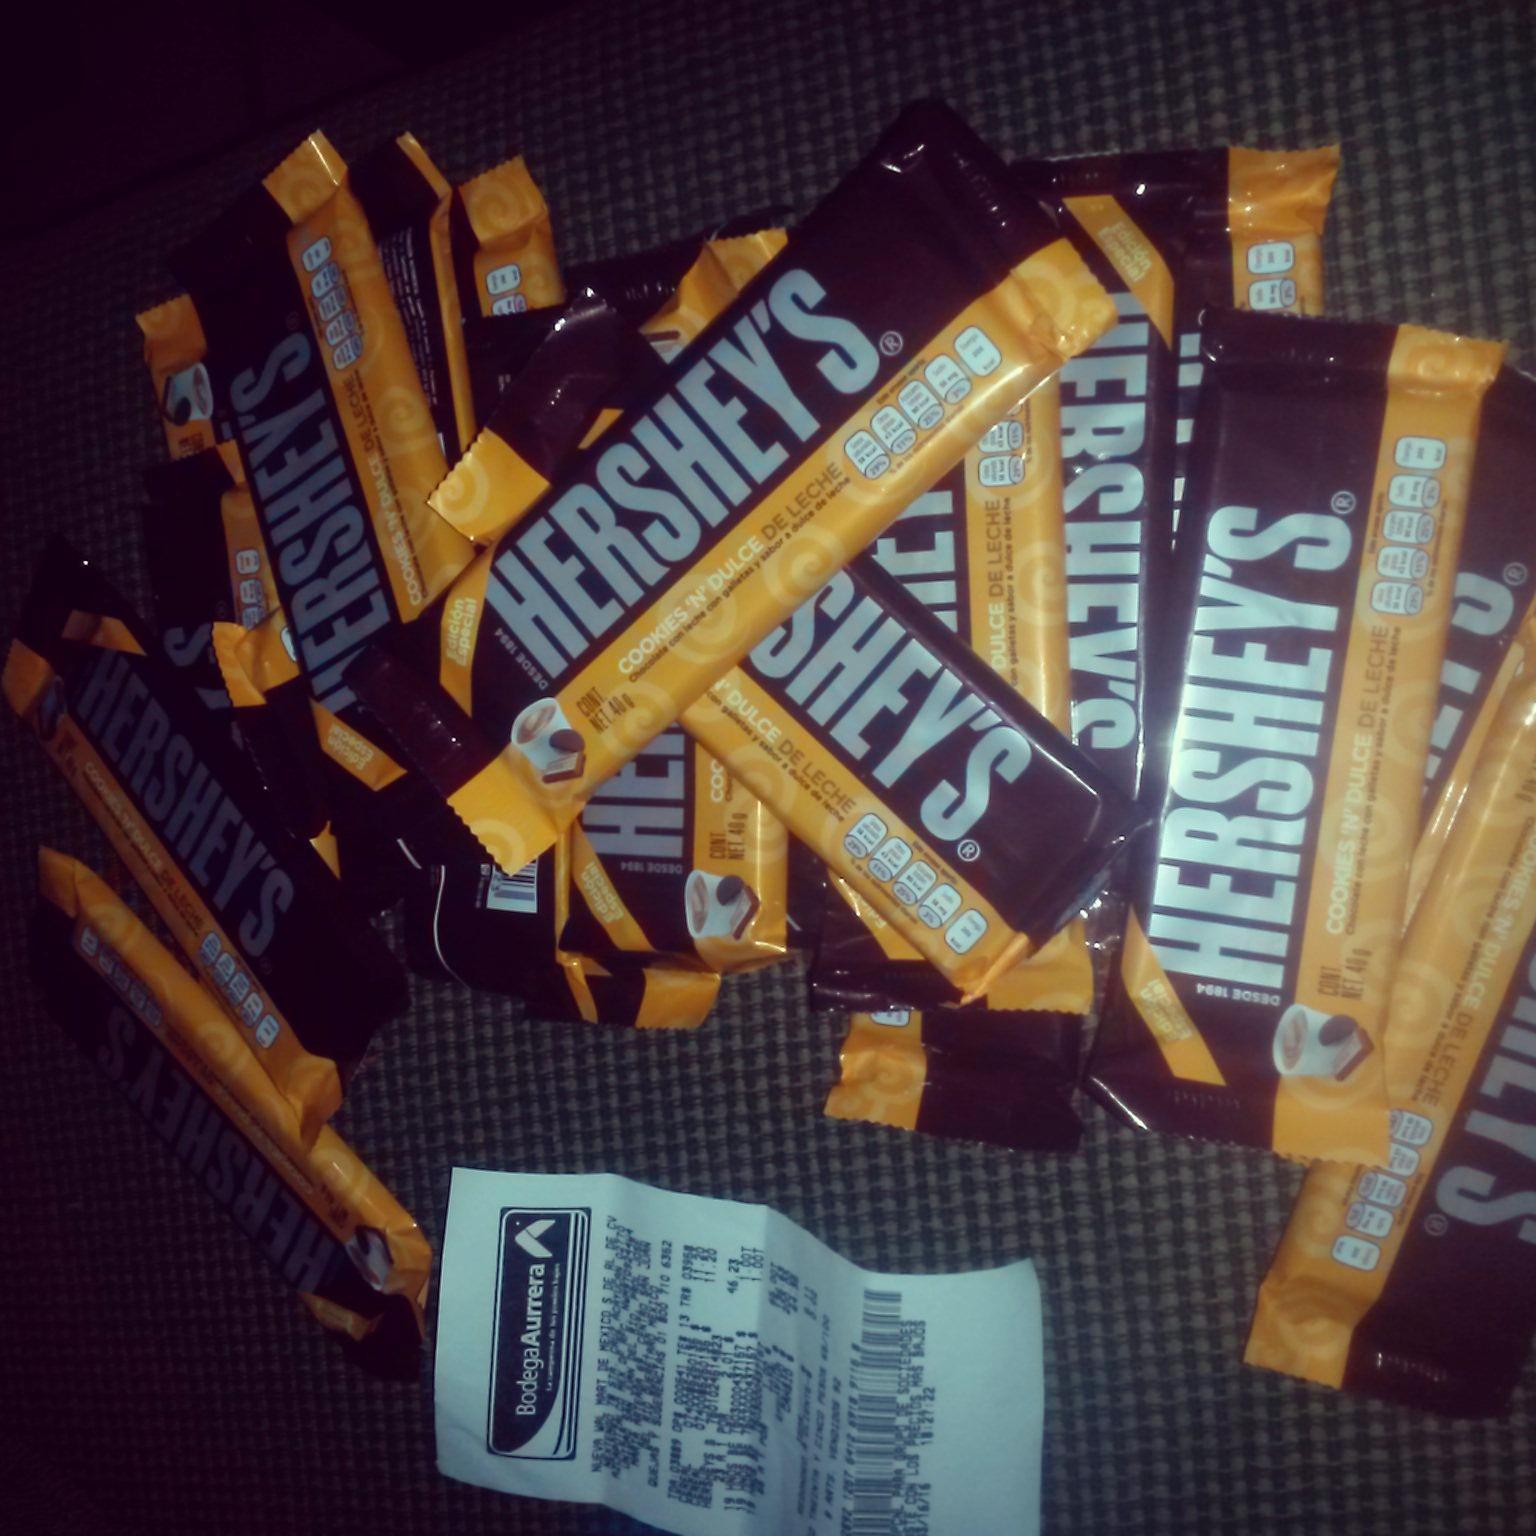 Bodega Aurrerá: Chocolate Hershey's a $2.01